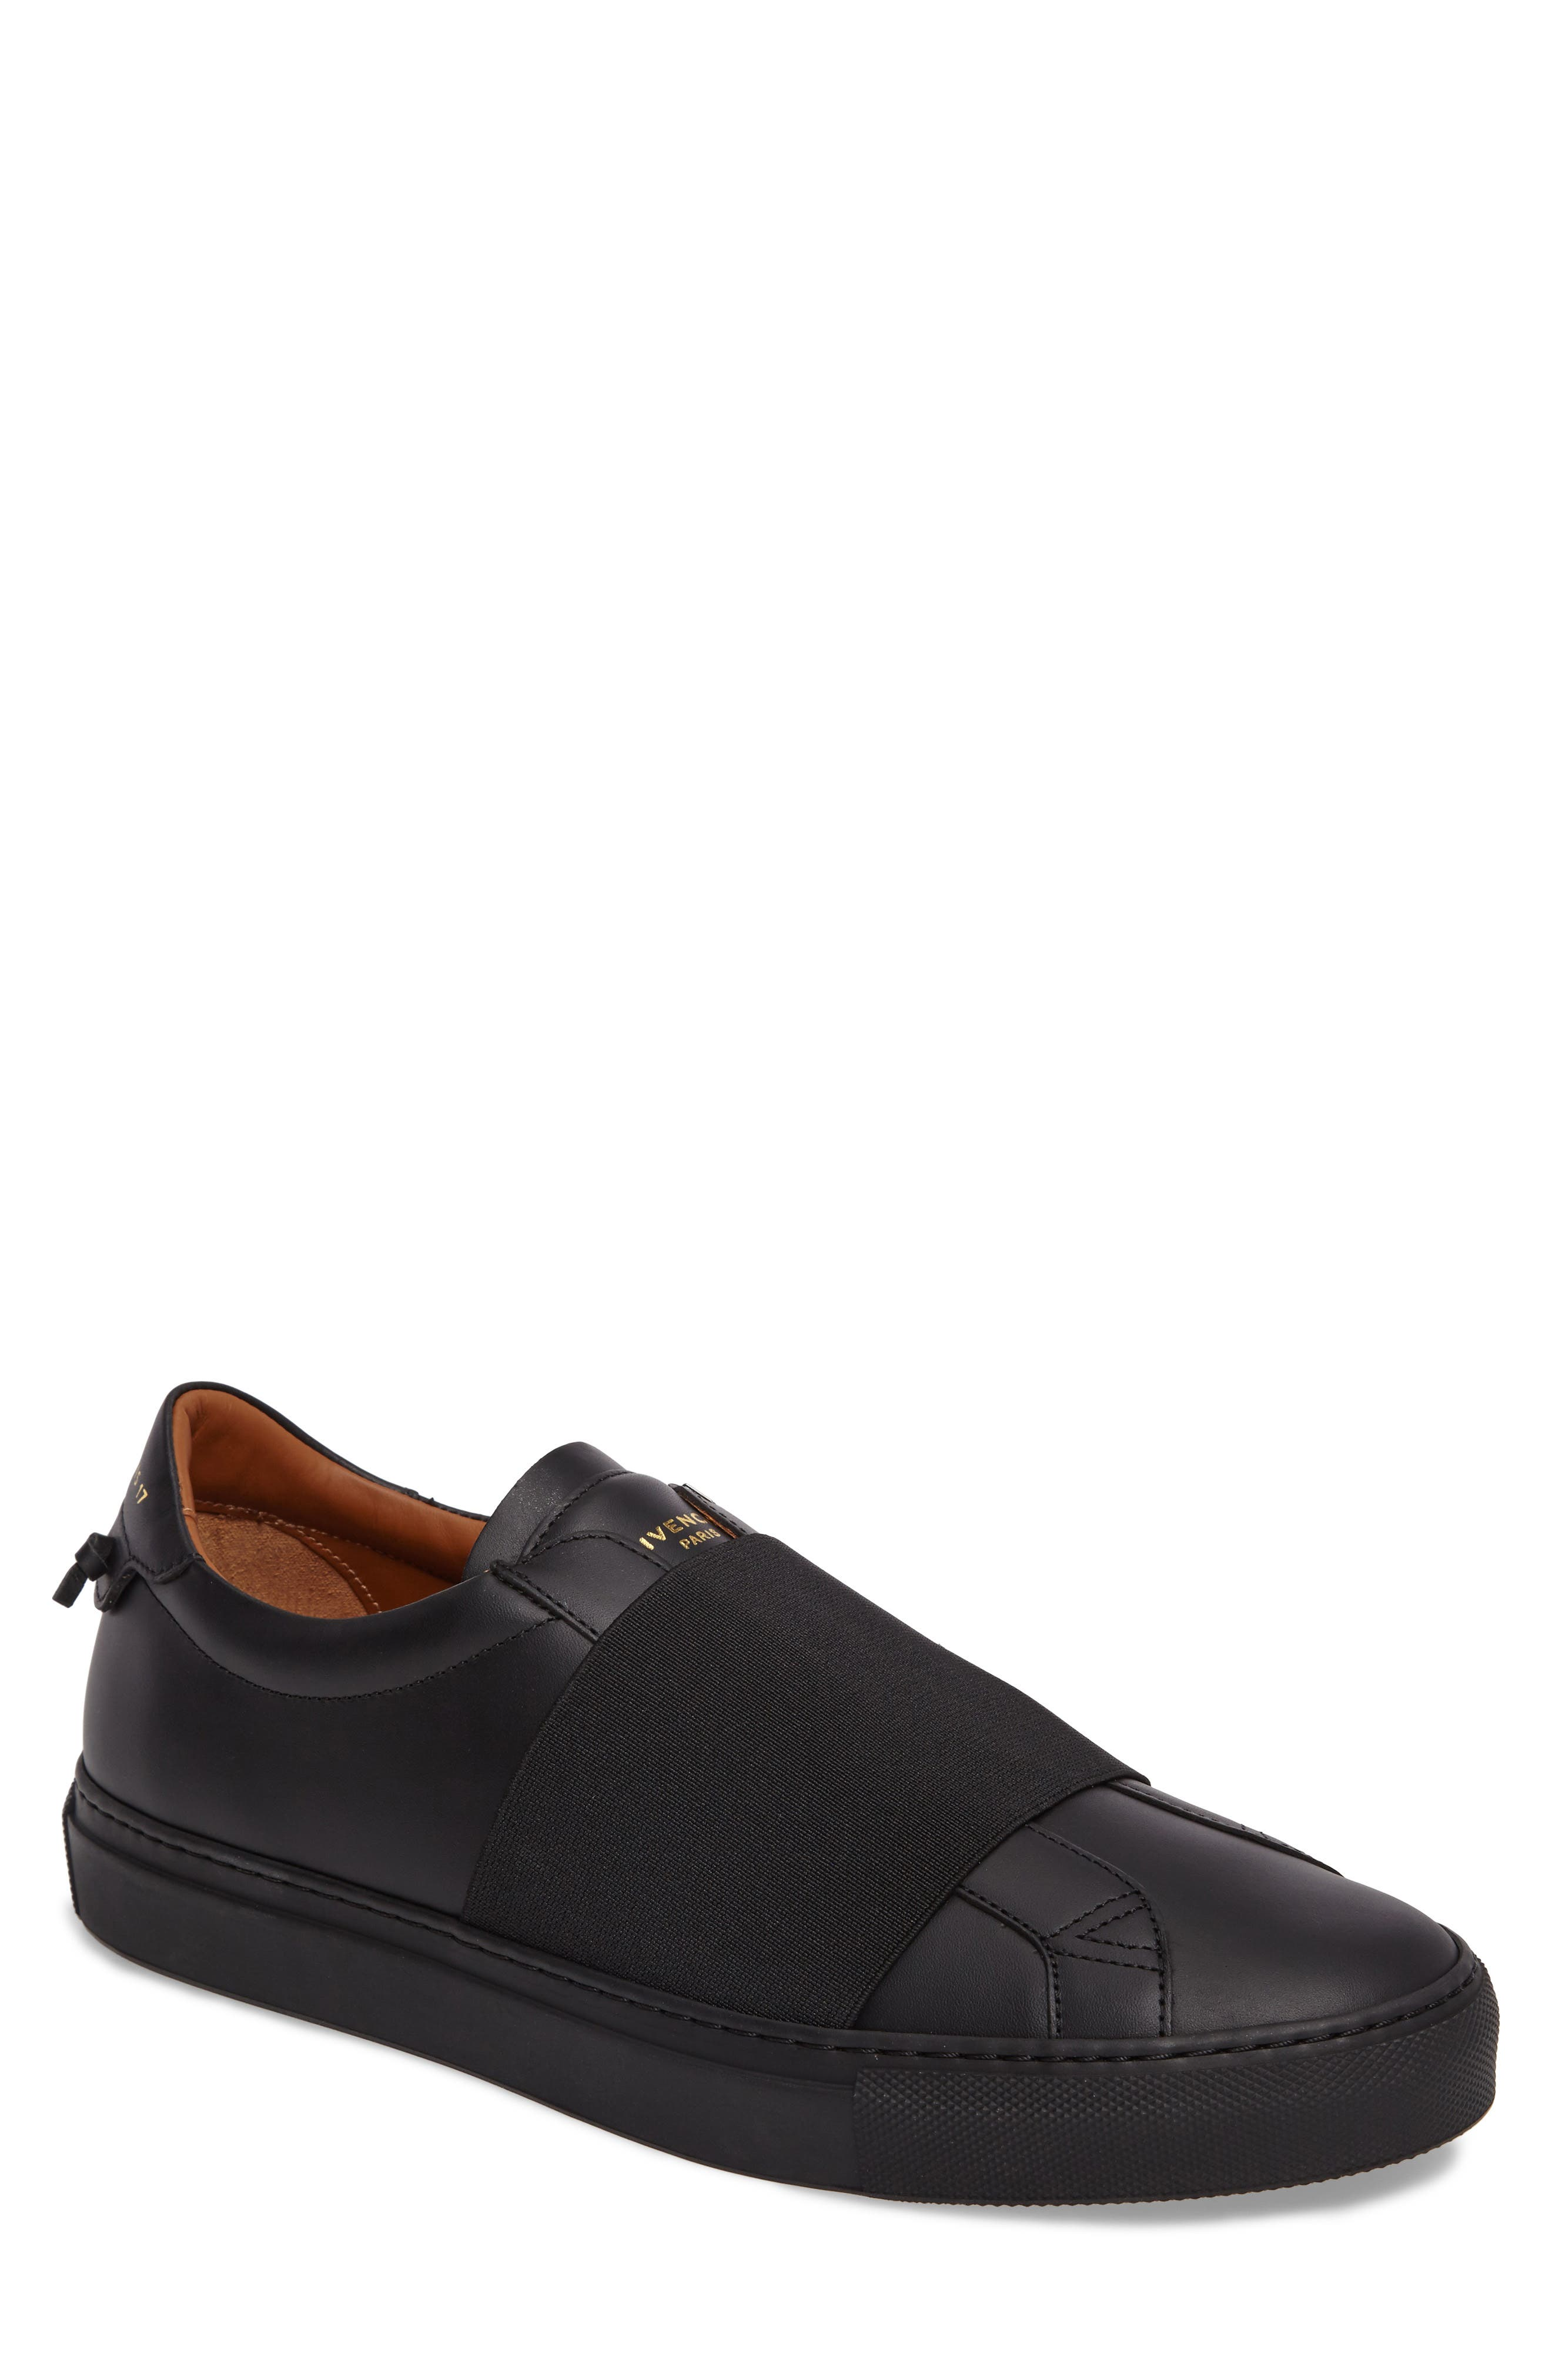 Slip-On Sneaker,                             Main thumbnail 1, color,                             Black